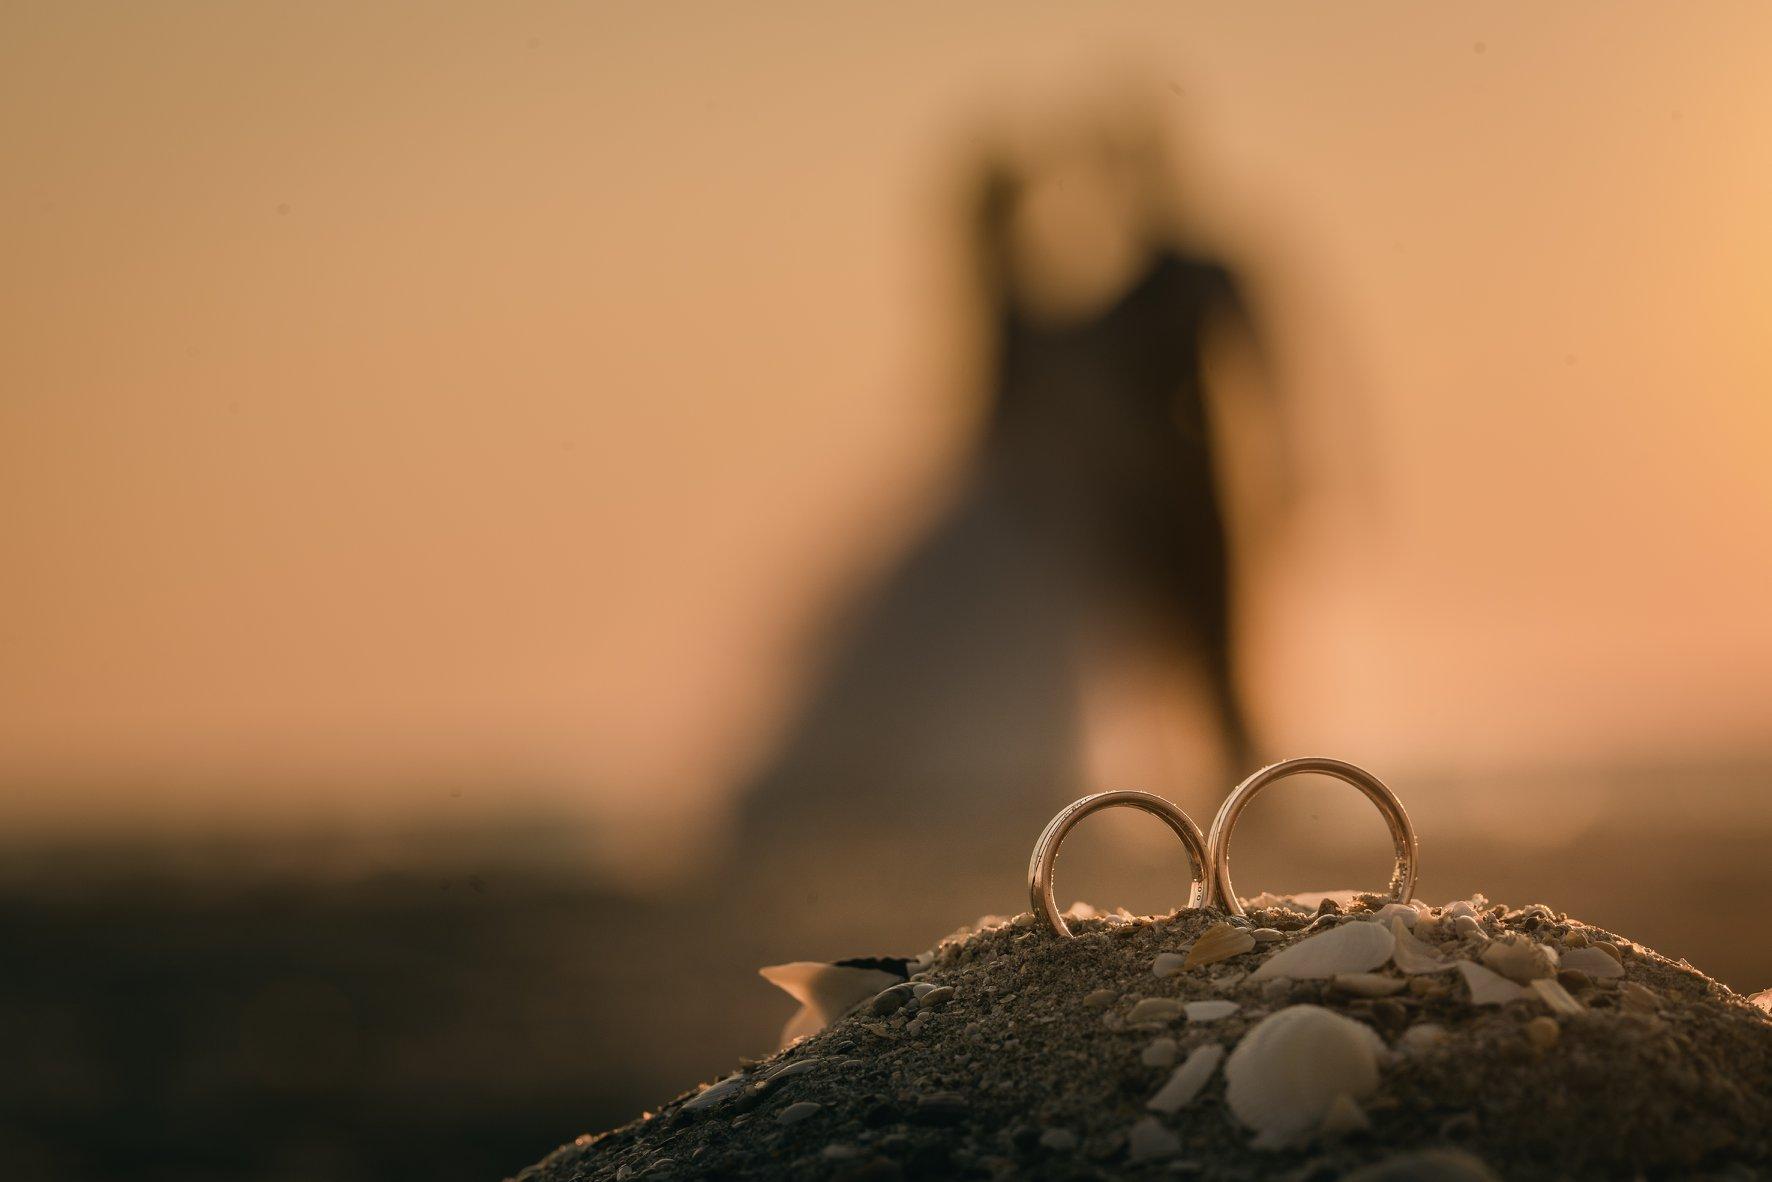 Filmari nunti preturi